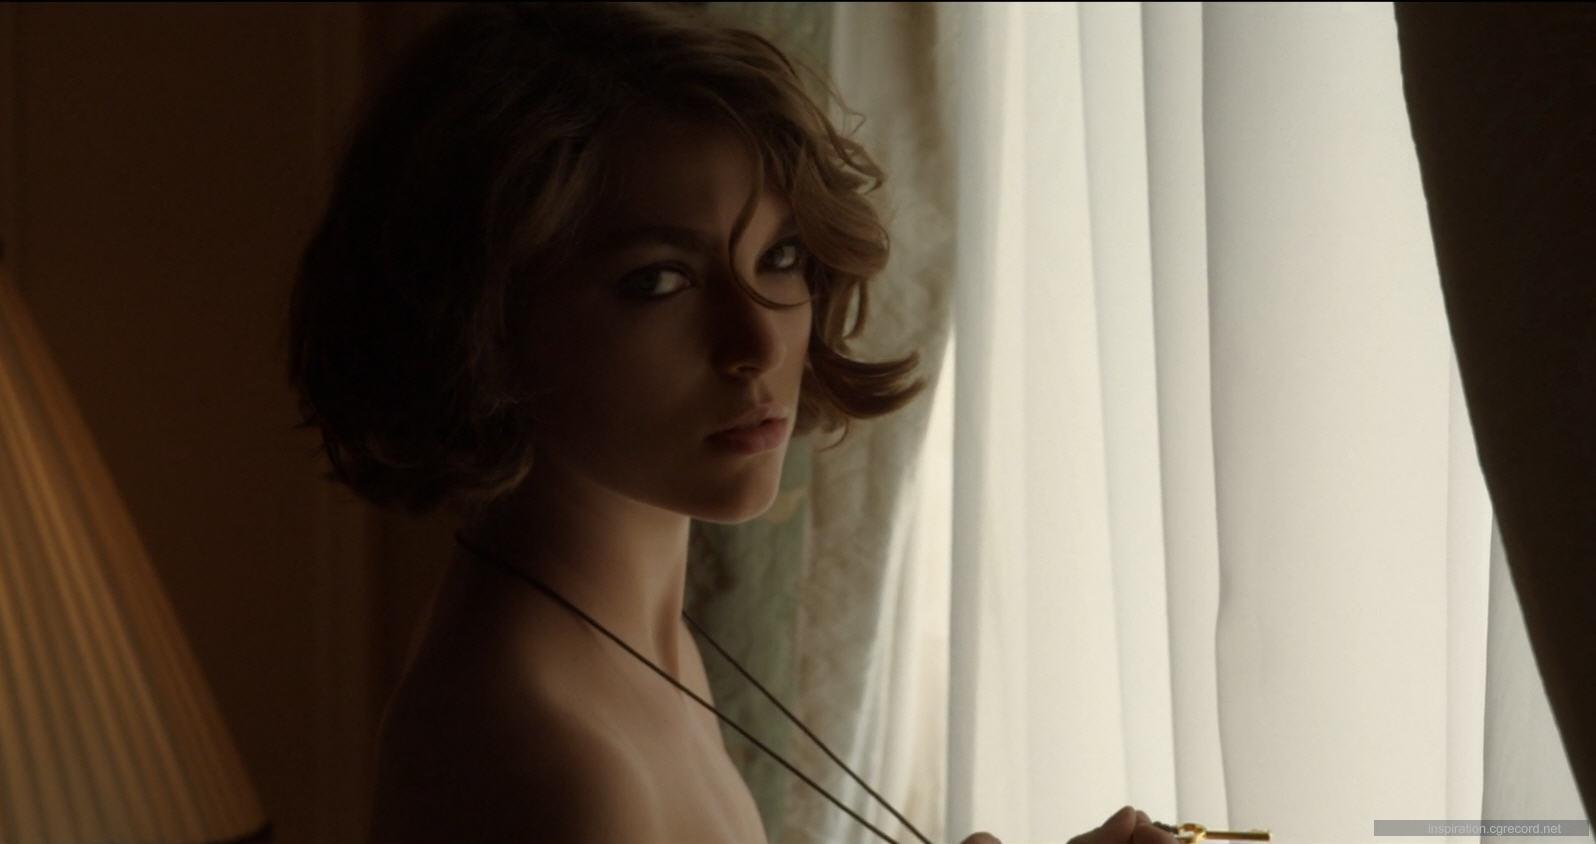 The Louis Vuitton Advertising Campaign Film: L'Invitation ...